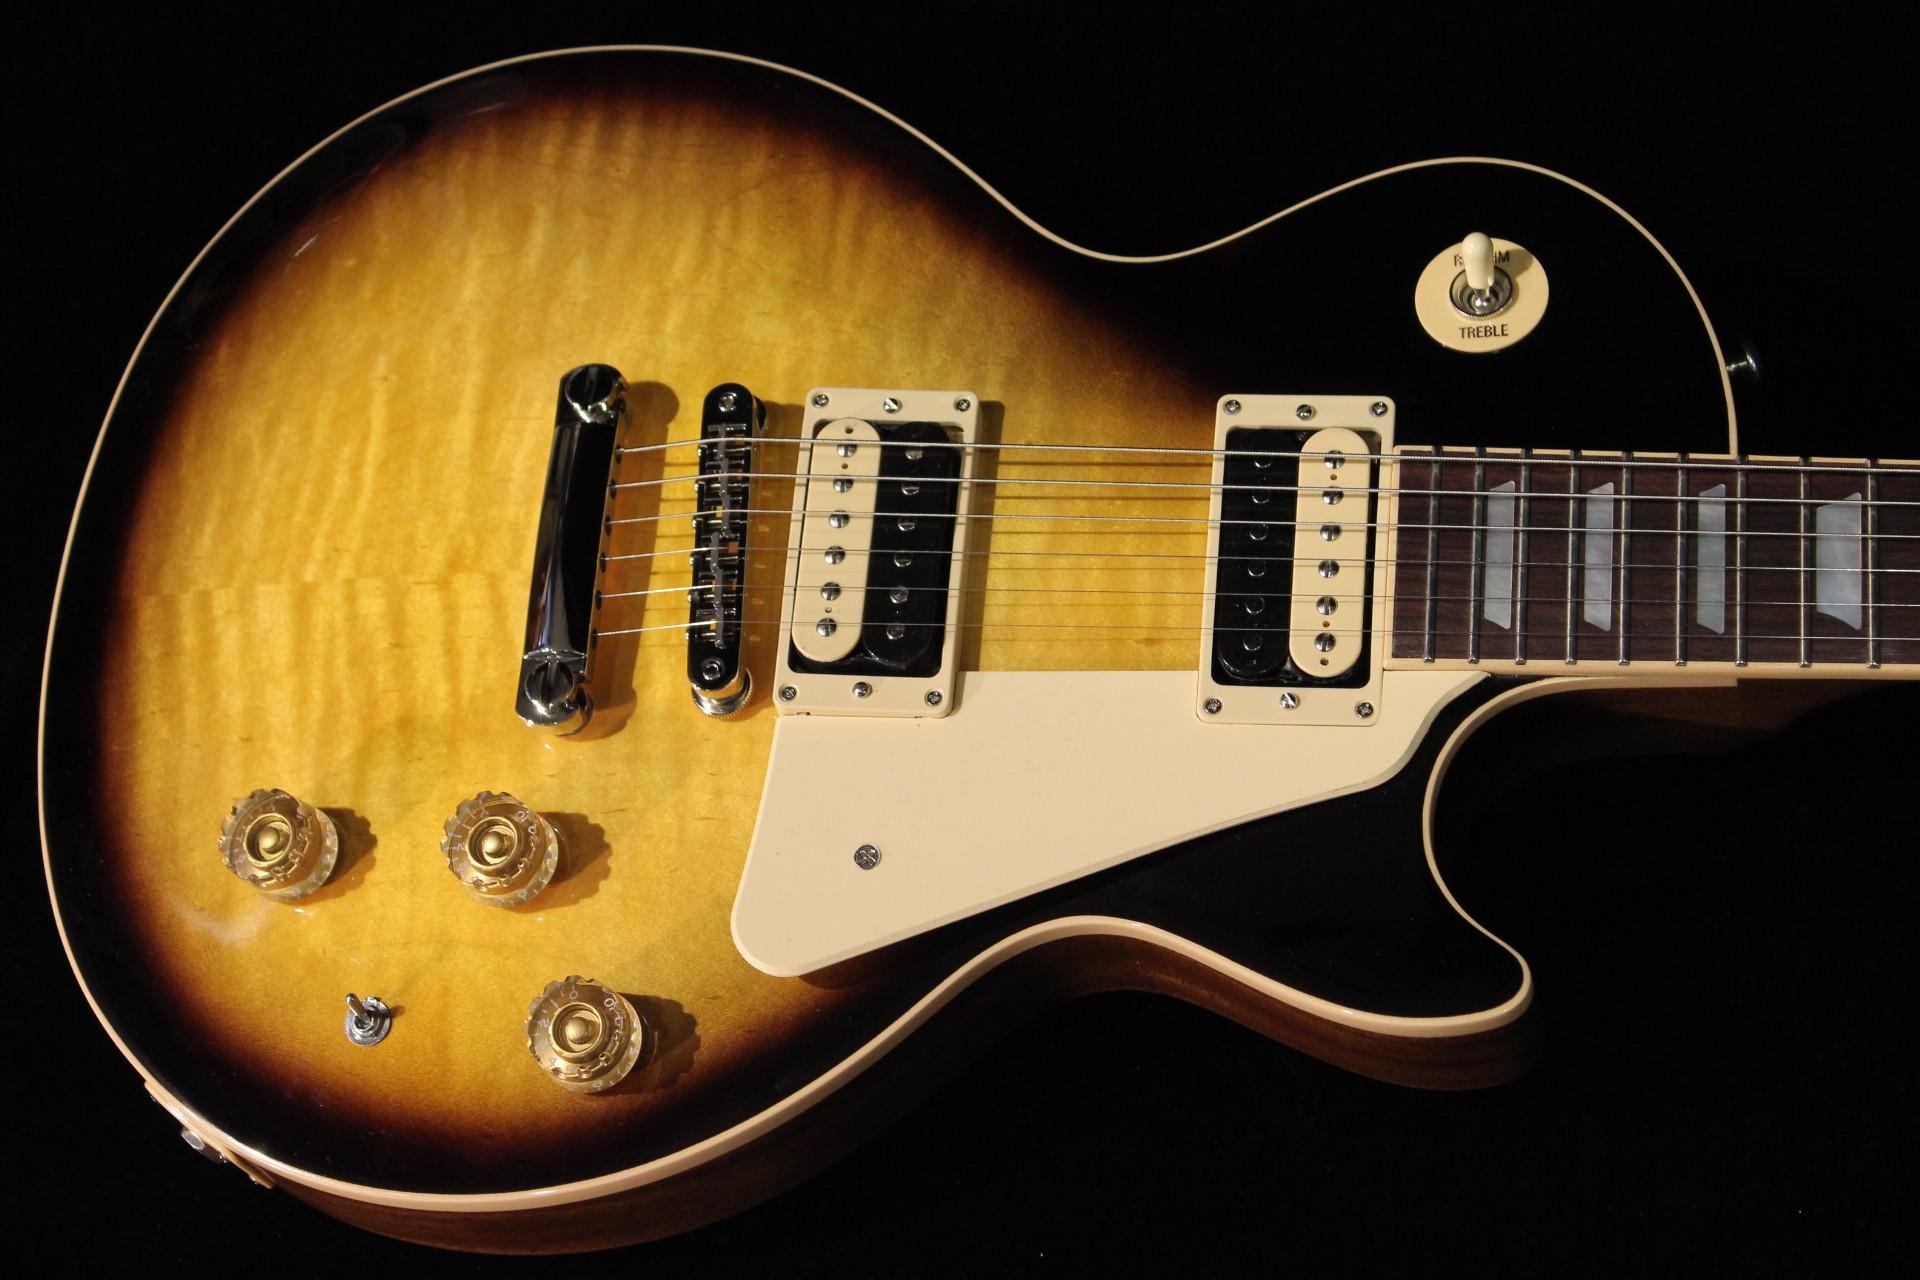 gibson usa gibson les paul classic 2015 vs sn 150036597 vintage sunburst guitar for sale gino. Black Bedroom Furniture Sets. Home Design Ideas